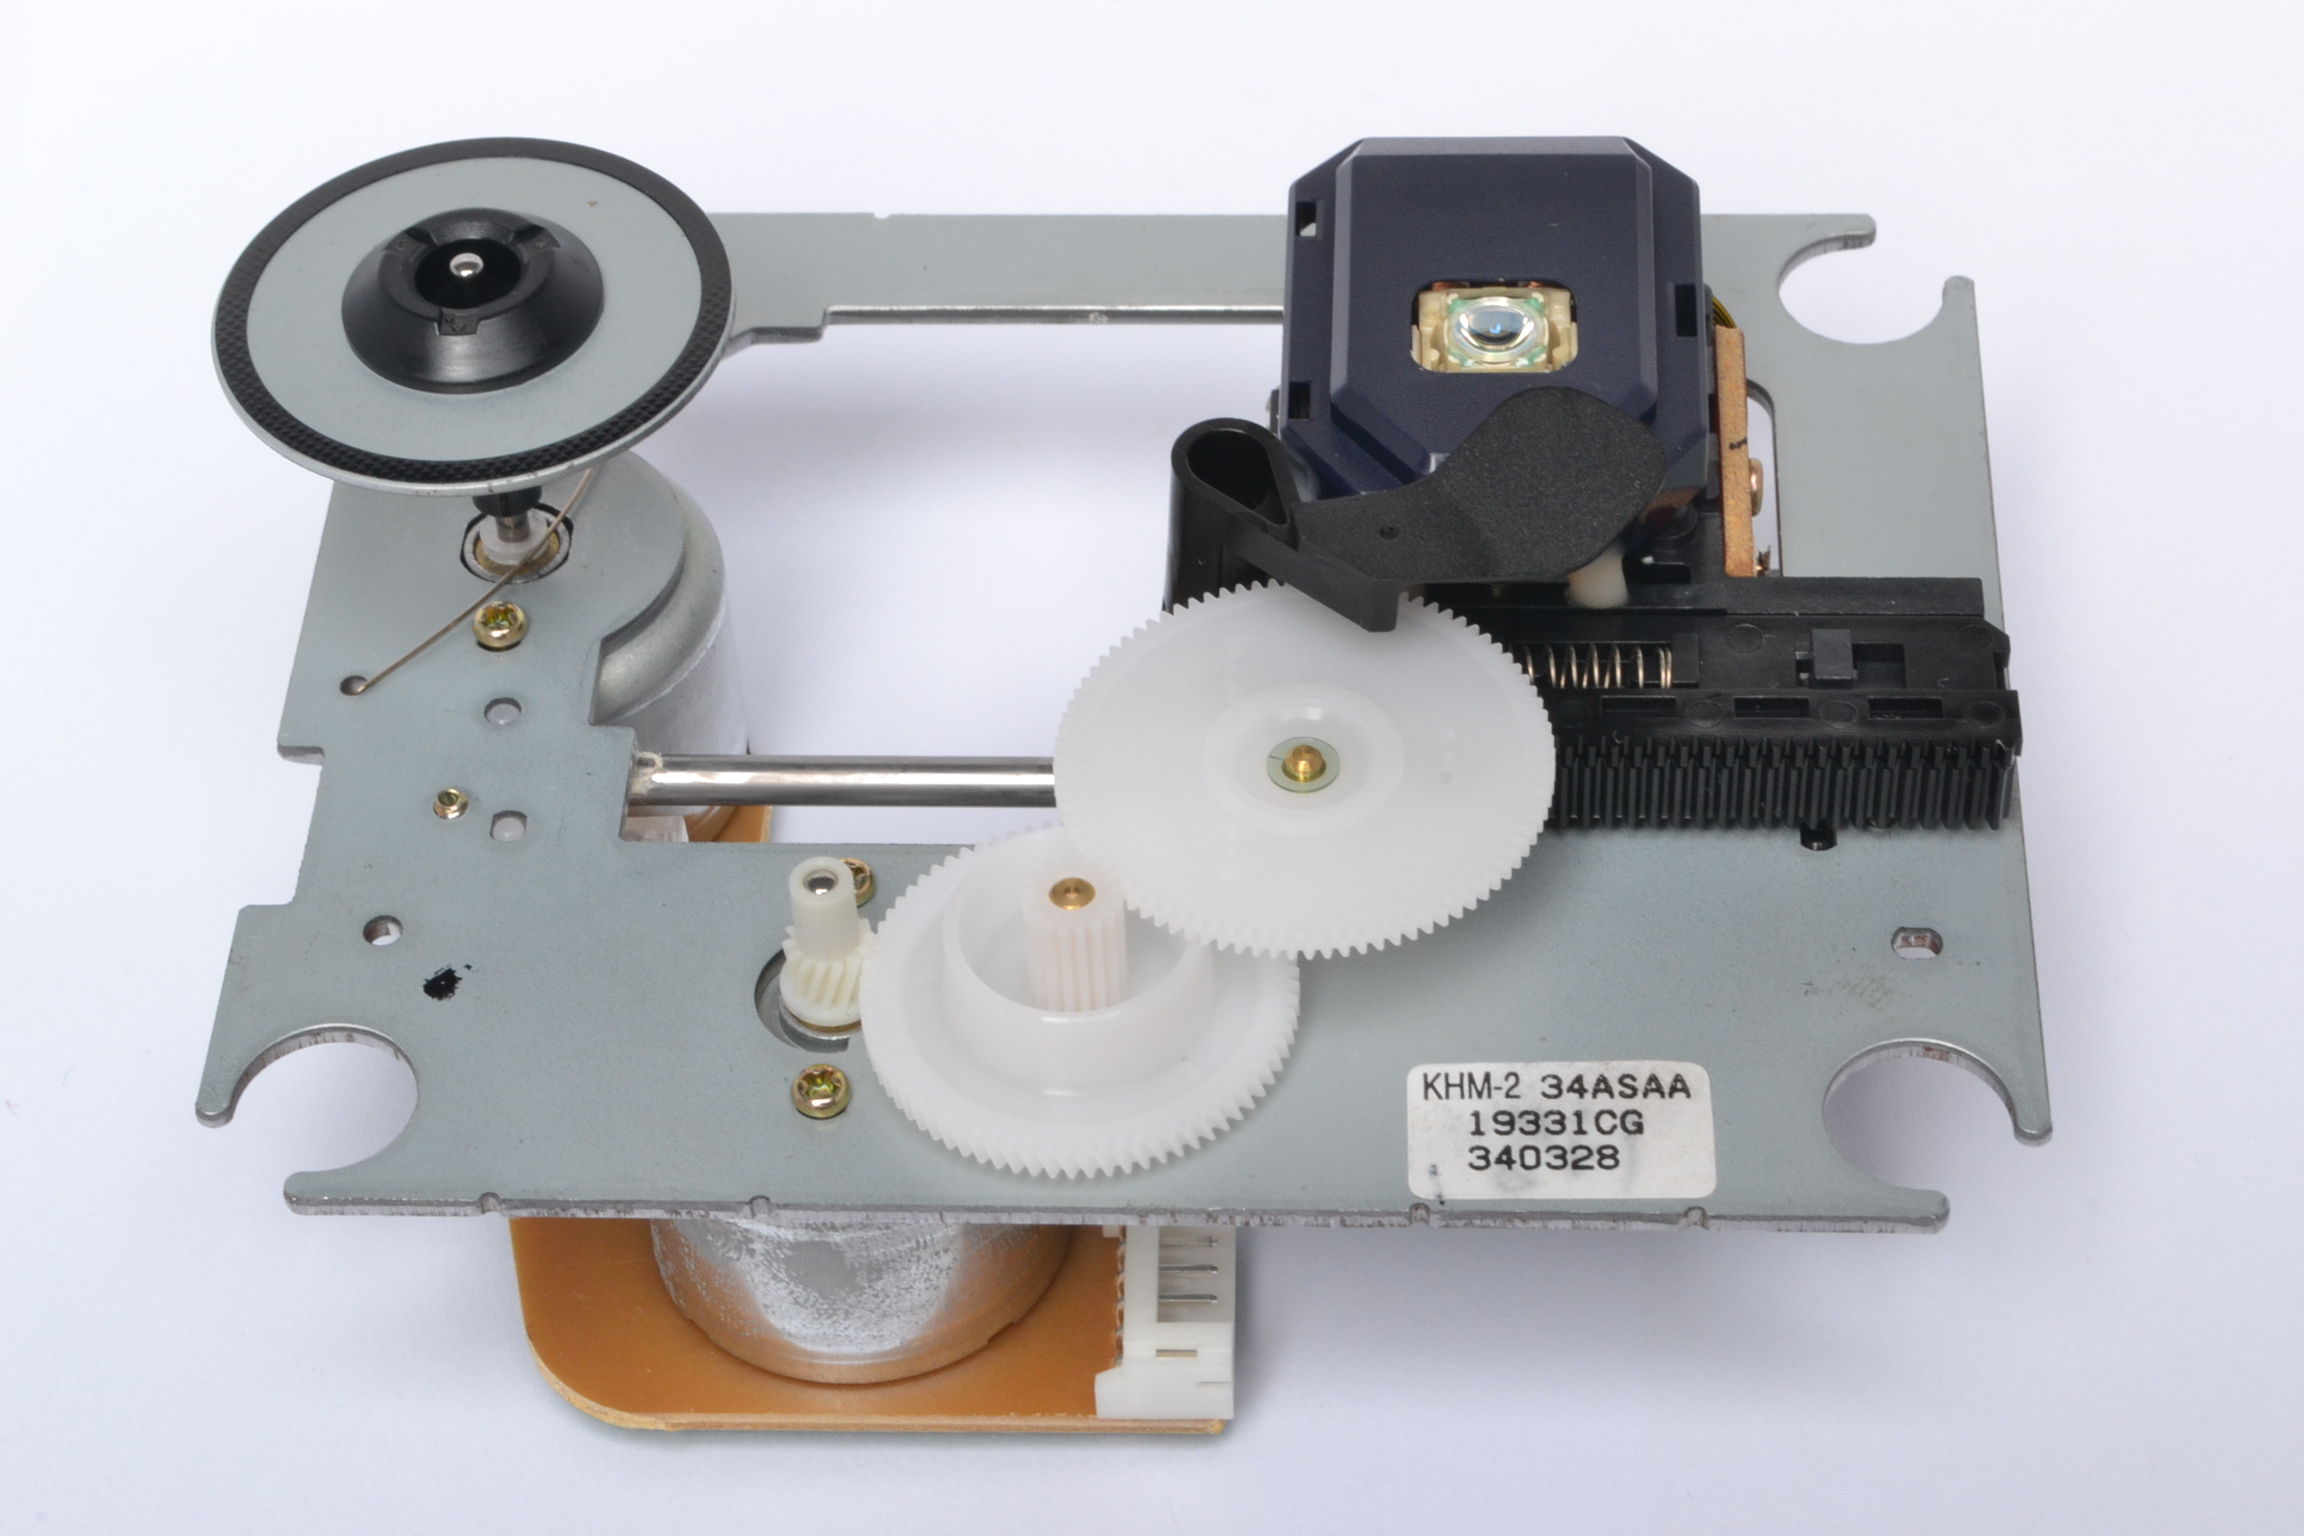 Optical Pick Up For KHM-234ASAA Laser Len KHM234ASAA Mechanism KHM-234AAA 234ASAA SACD Optical Bloc